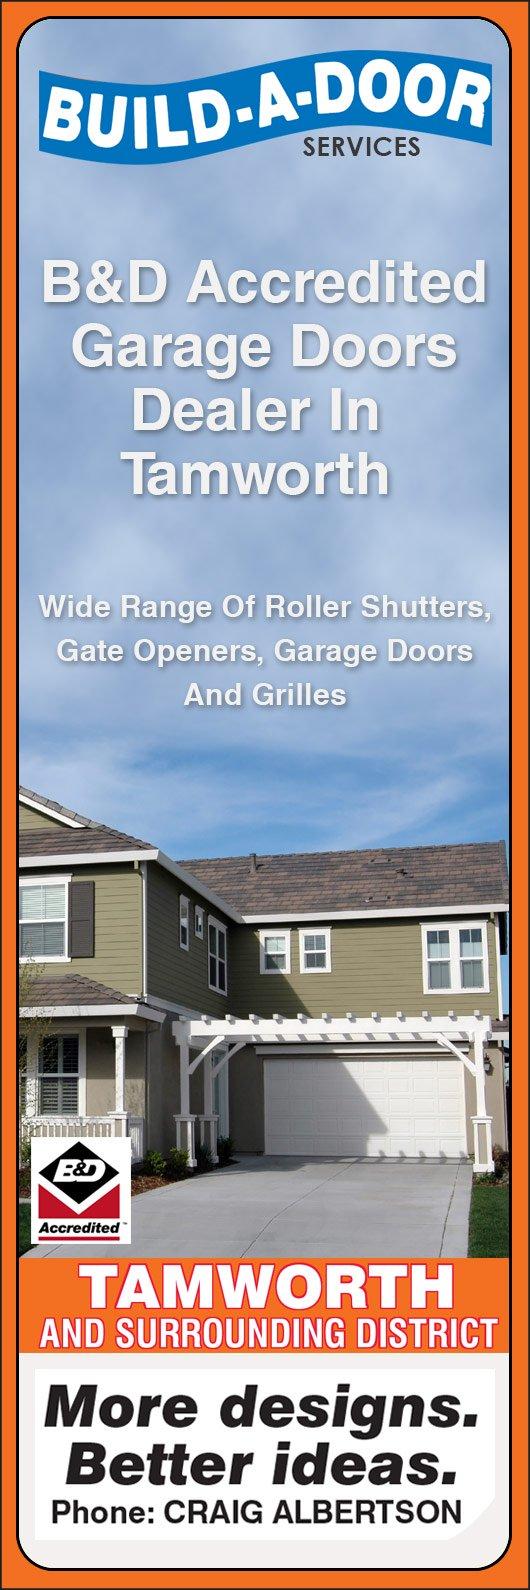 Build A Door Services Garage Doors Fittings 99 Kable Ave